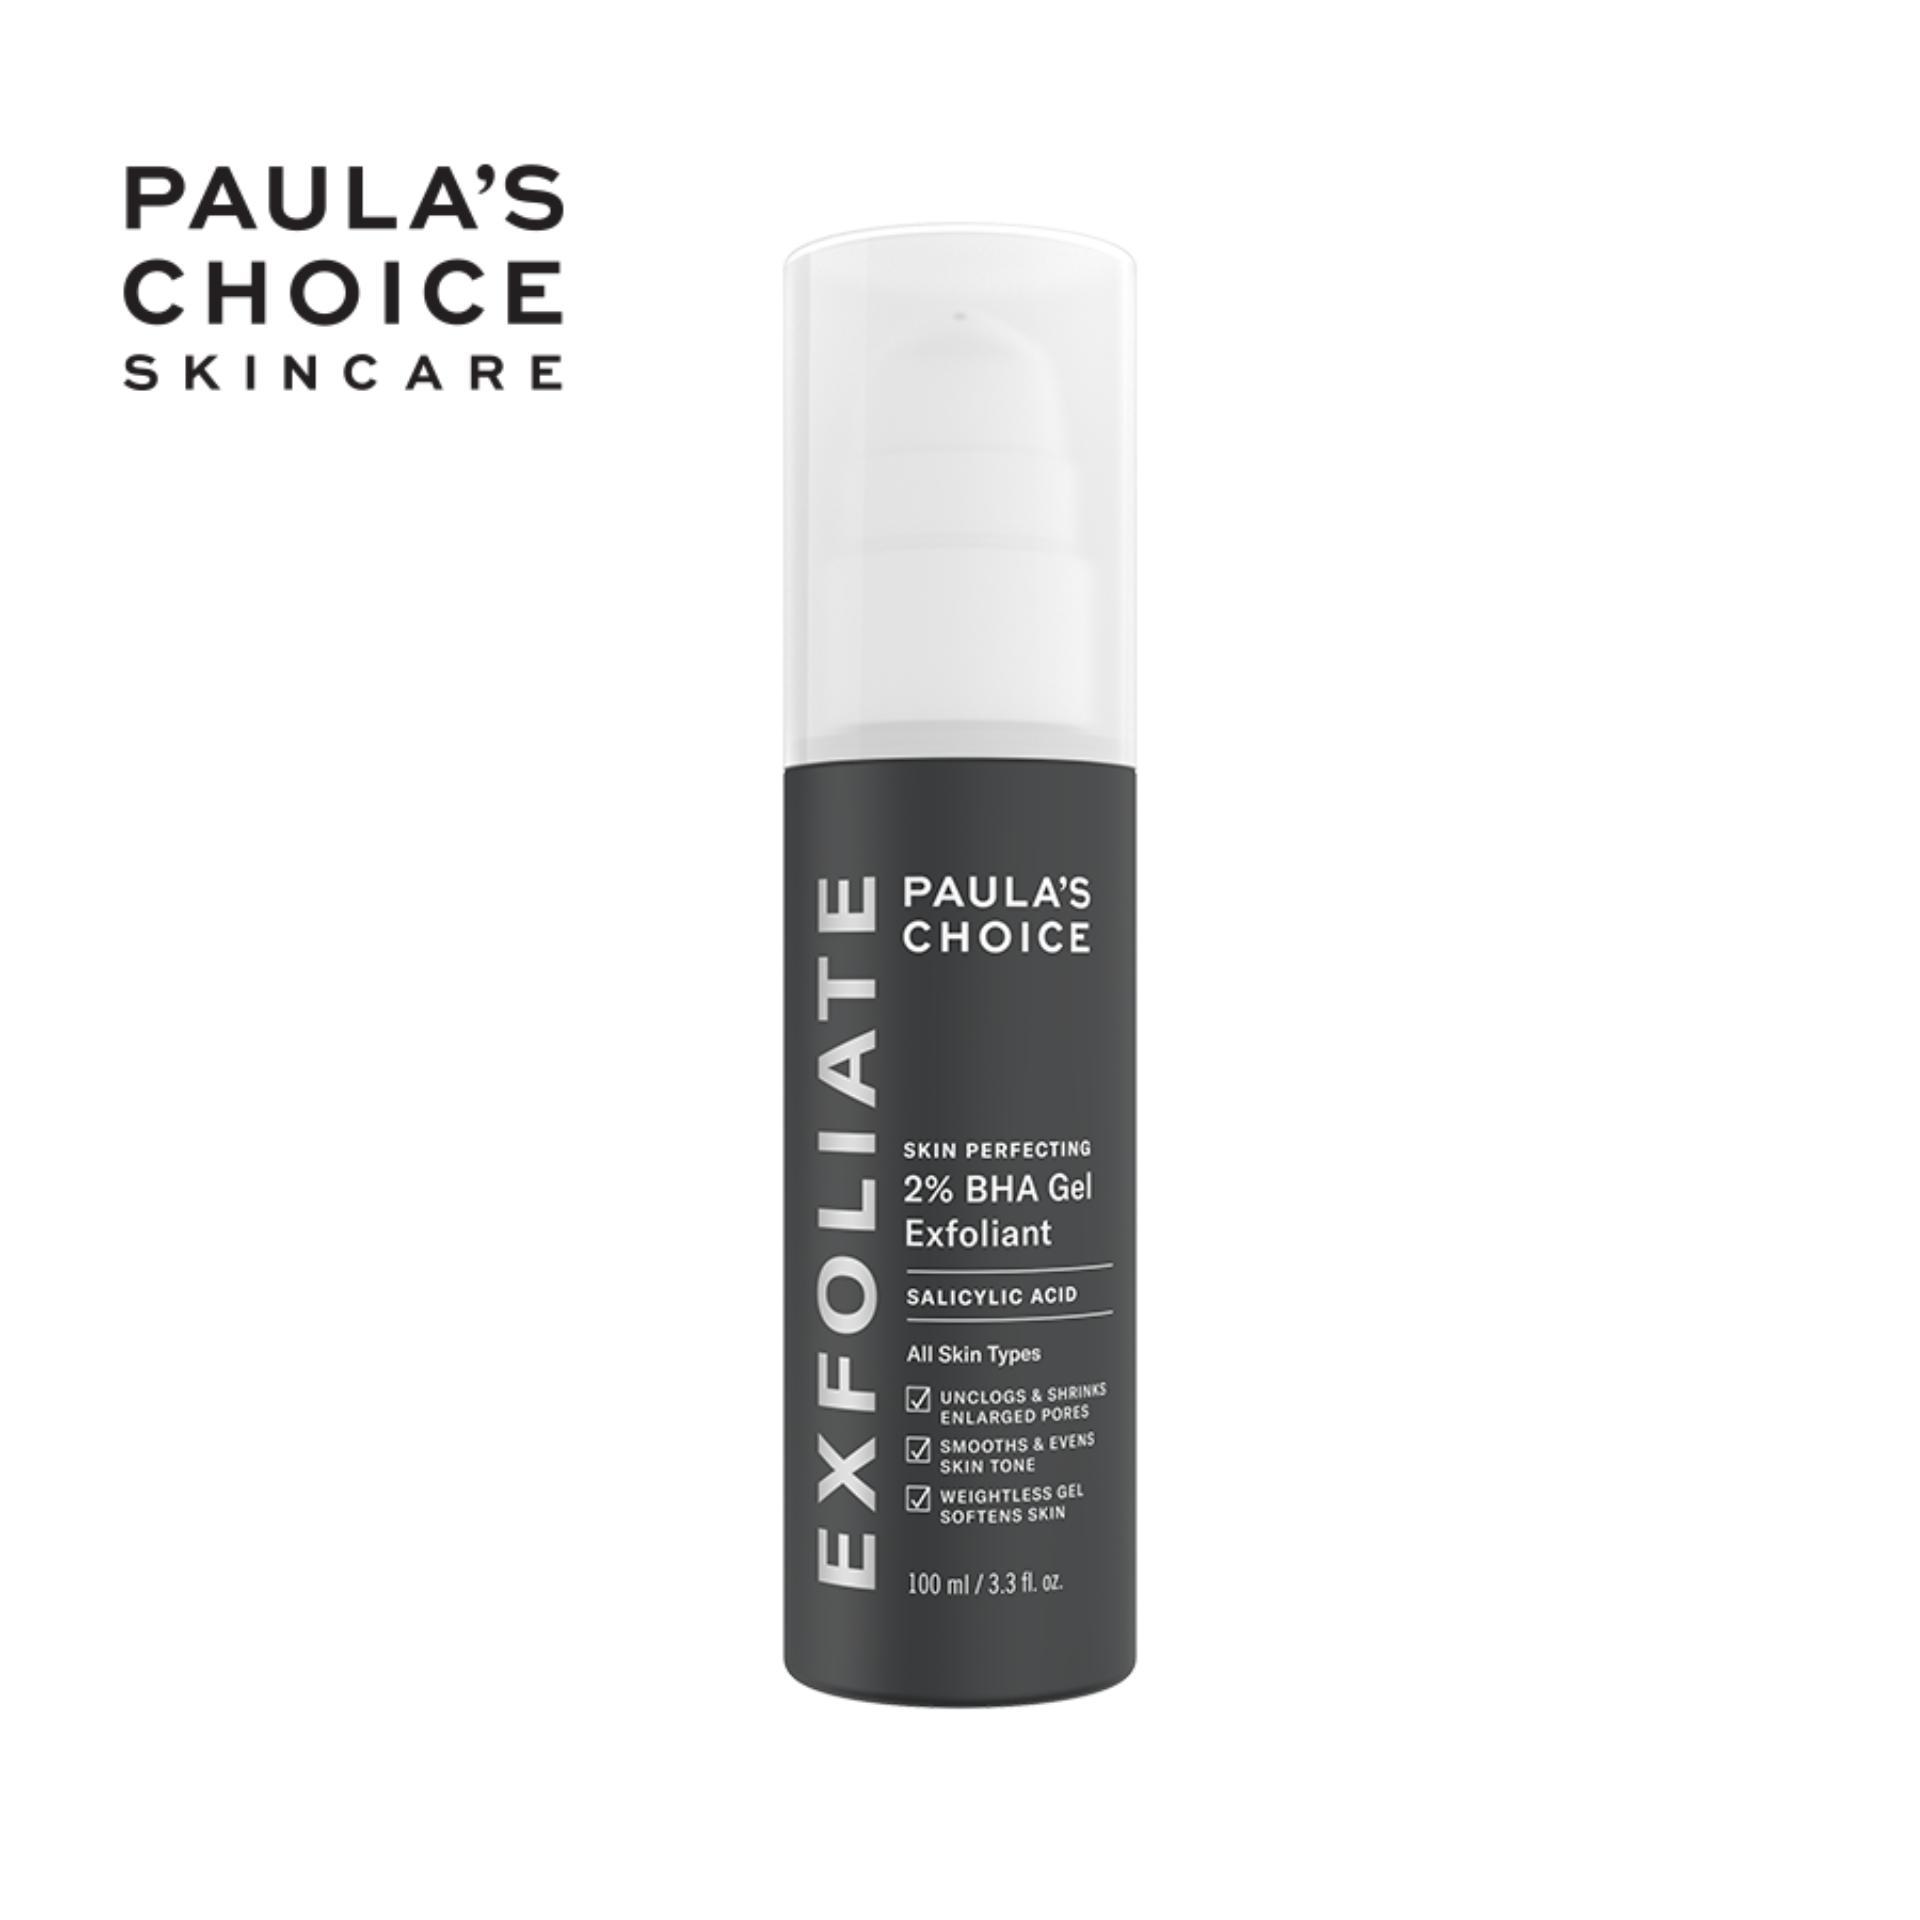 Kem loại bỏ tế bào chết Paula's Choice Skin Perfecting 2% BHA Gel Exfoliant 100ml-2040 cao cấp